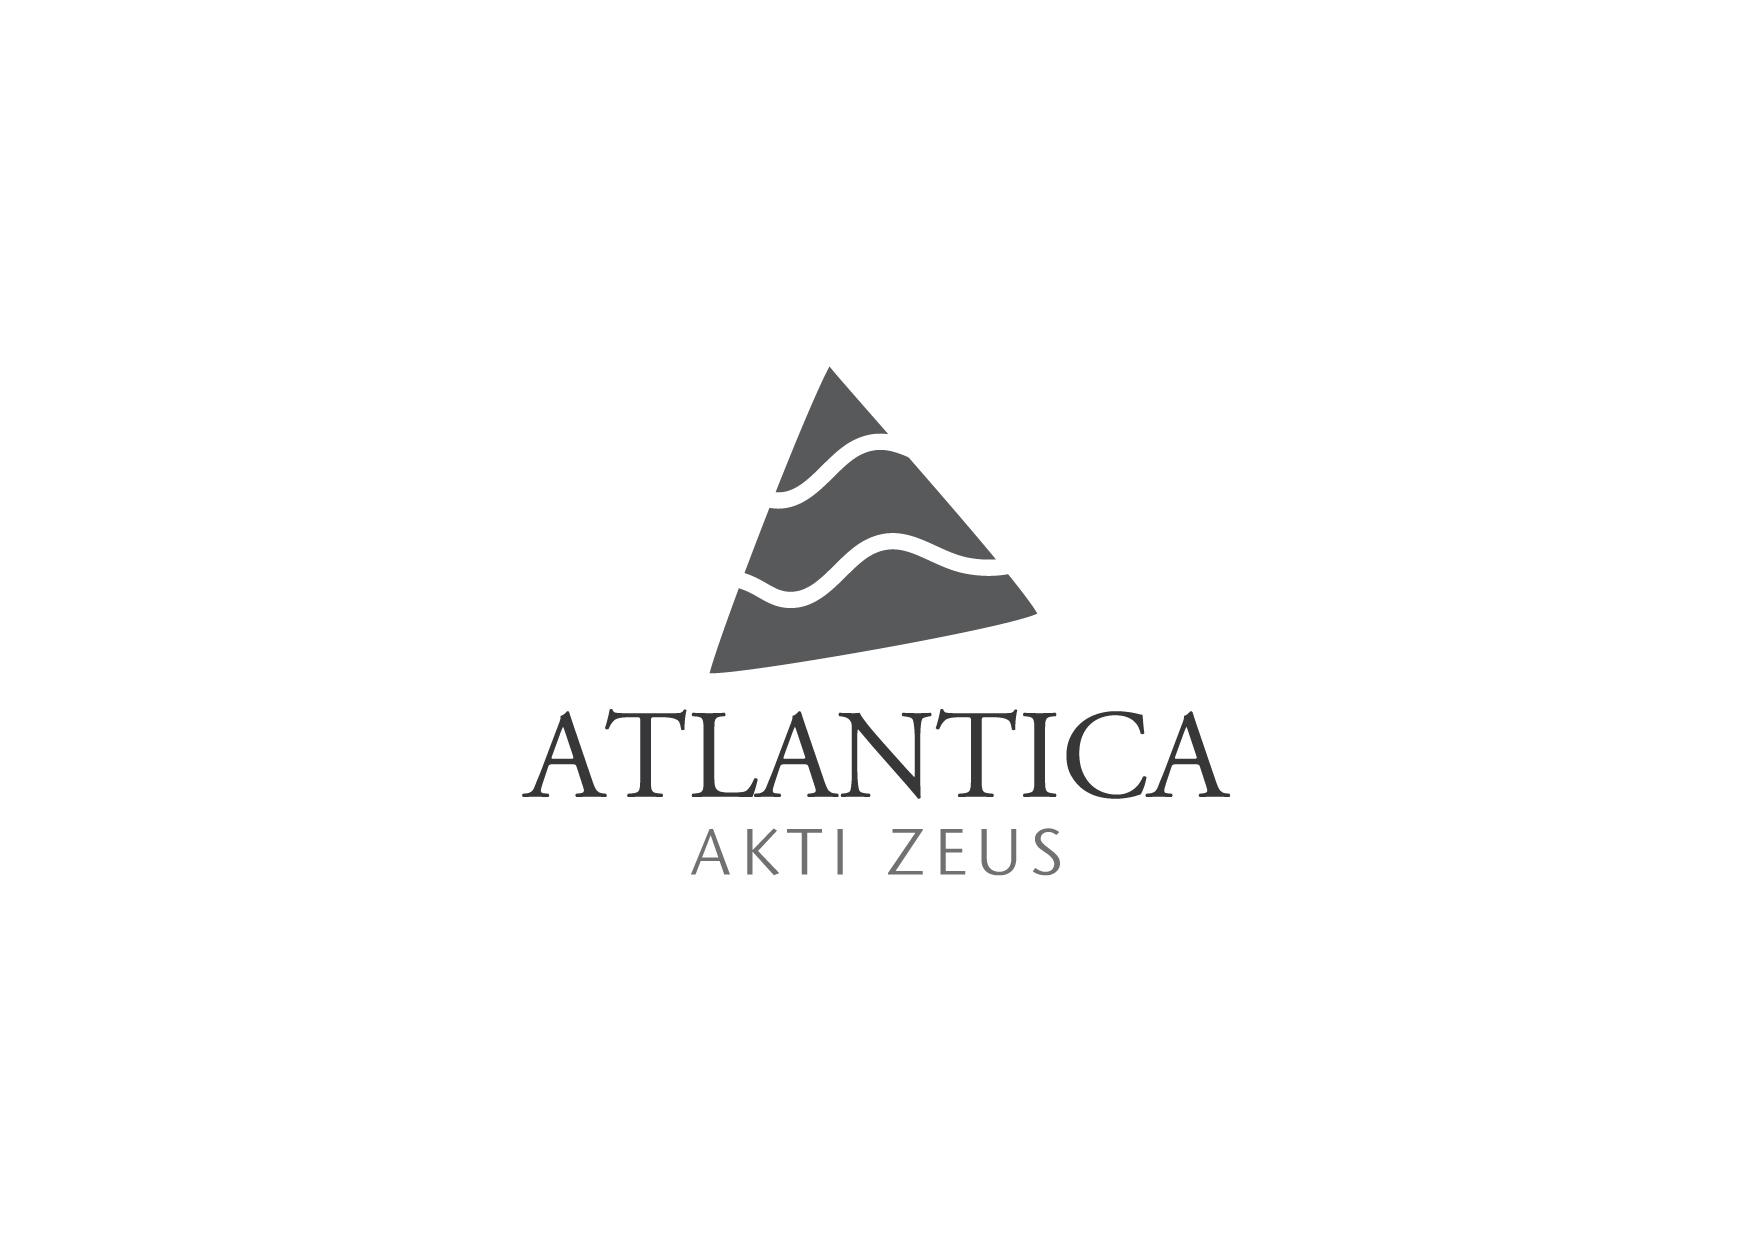 Index of /wp-content/uploads/images/hotels/atlantica-akti-zeus